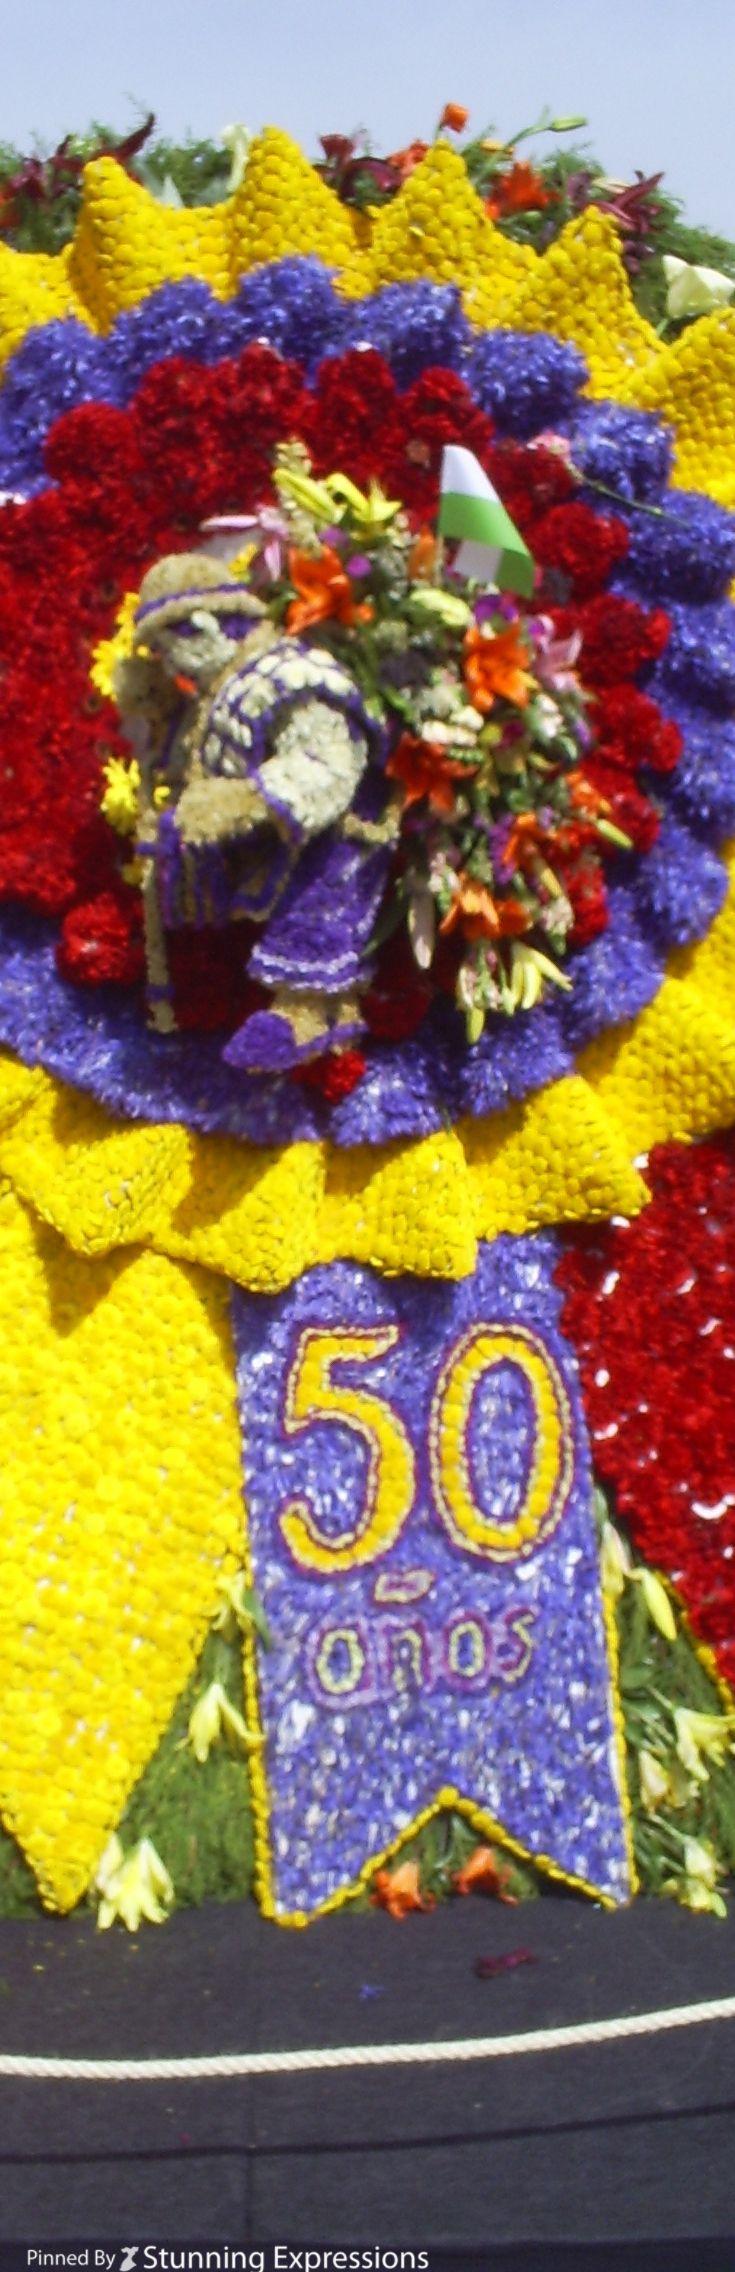 Flowers Parade ( Desfile de Silleteros) 50 Years - Medellin | Colombia